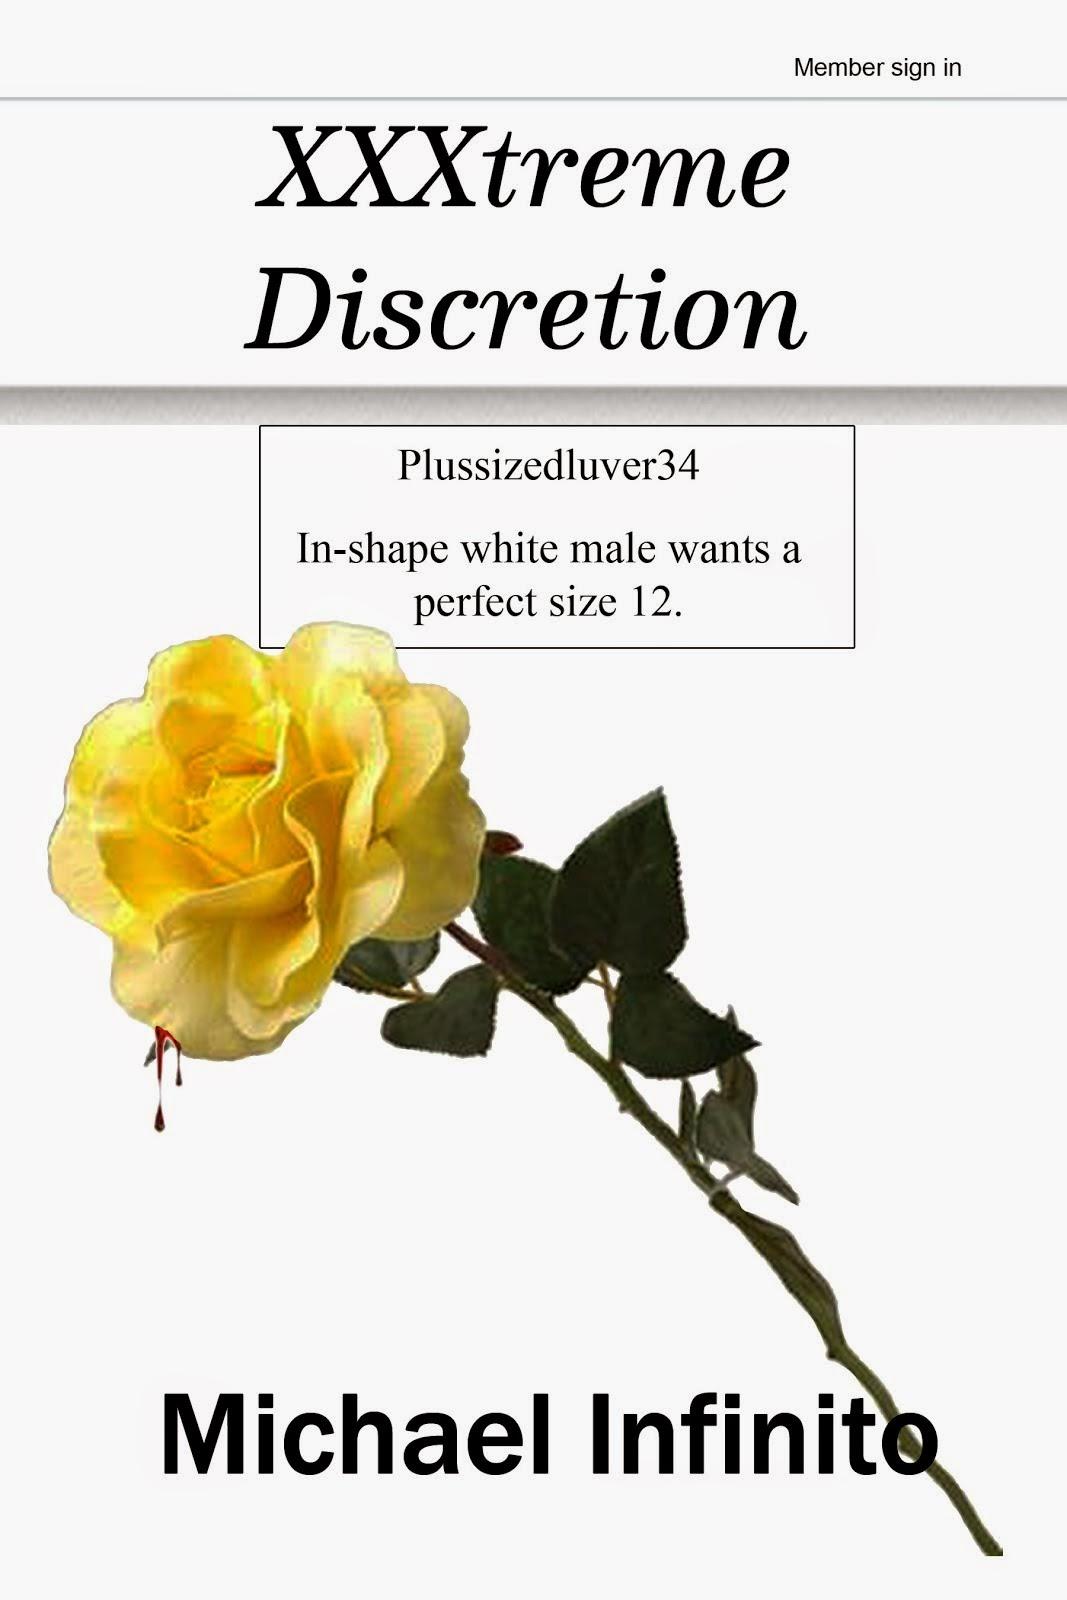 XXXtreme Discretion